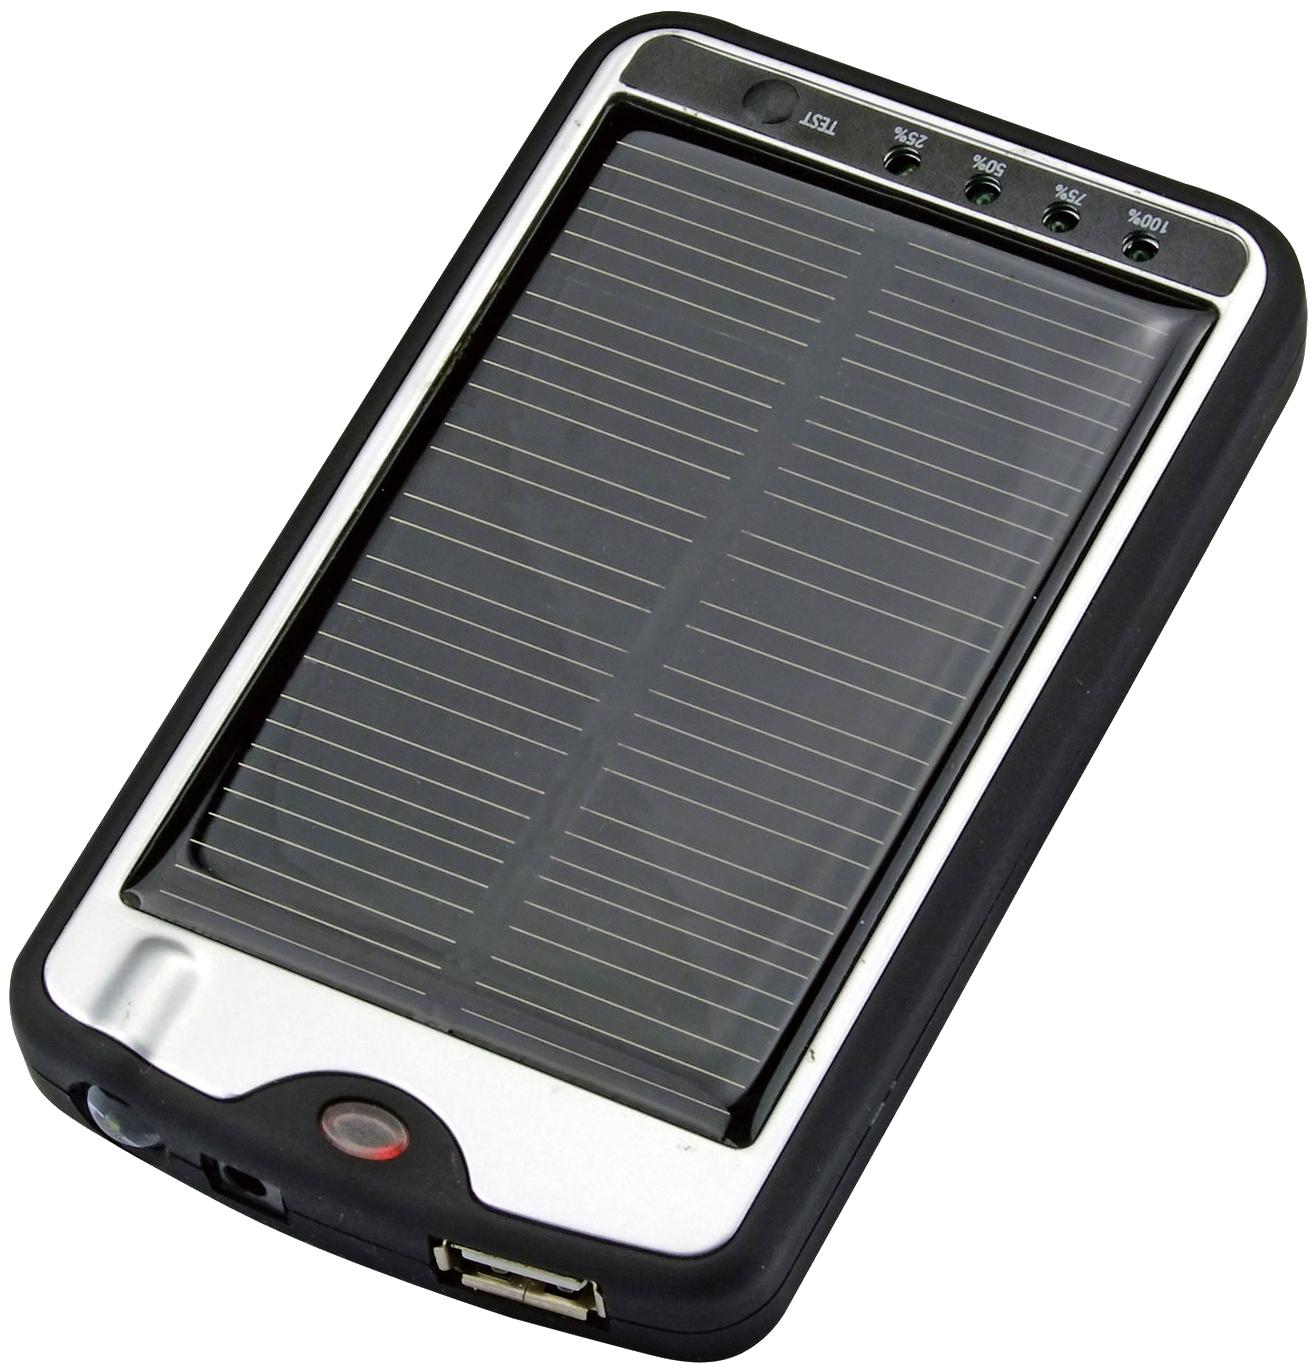 Фото портативного зарядного устройства Универсальное зарядное устройство на солнечных батареях для PocketBook 611...